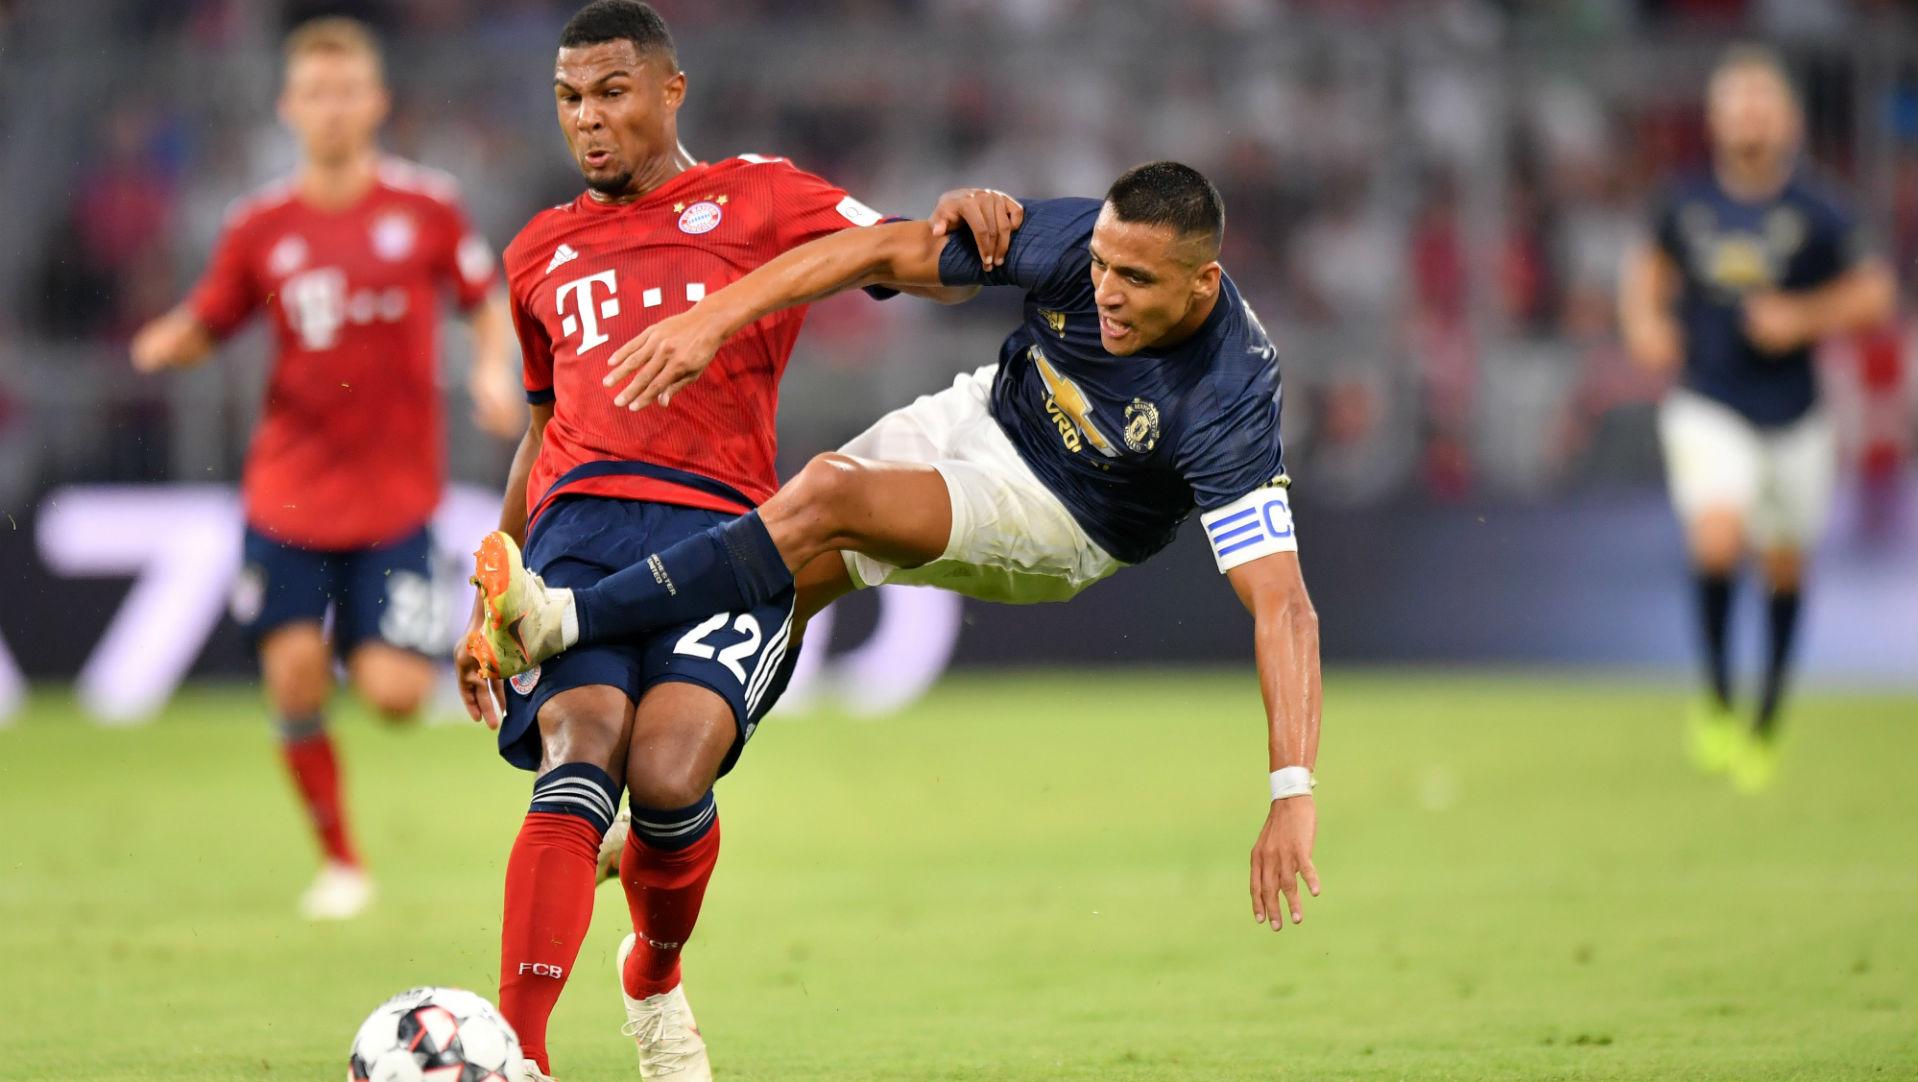 050818 Alexis Sánchez Serge Gnabry Manchester United Bayern Münich